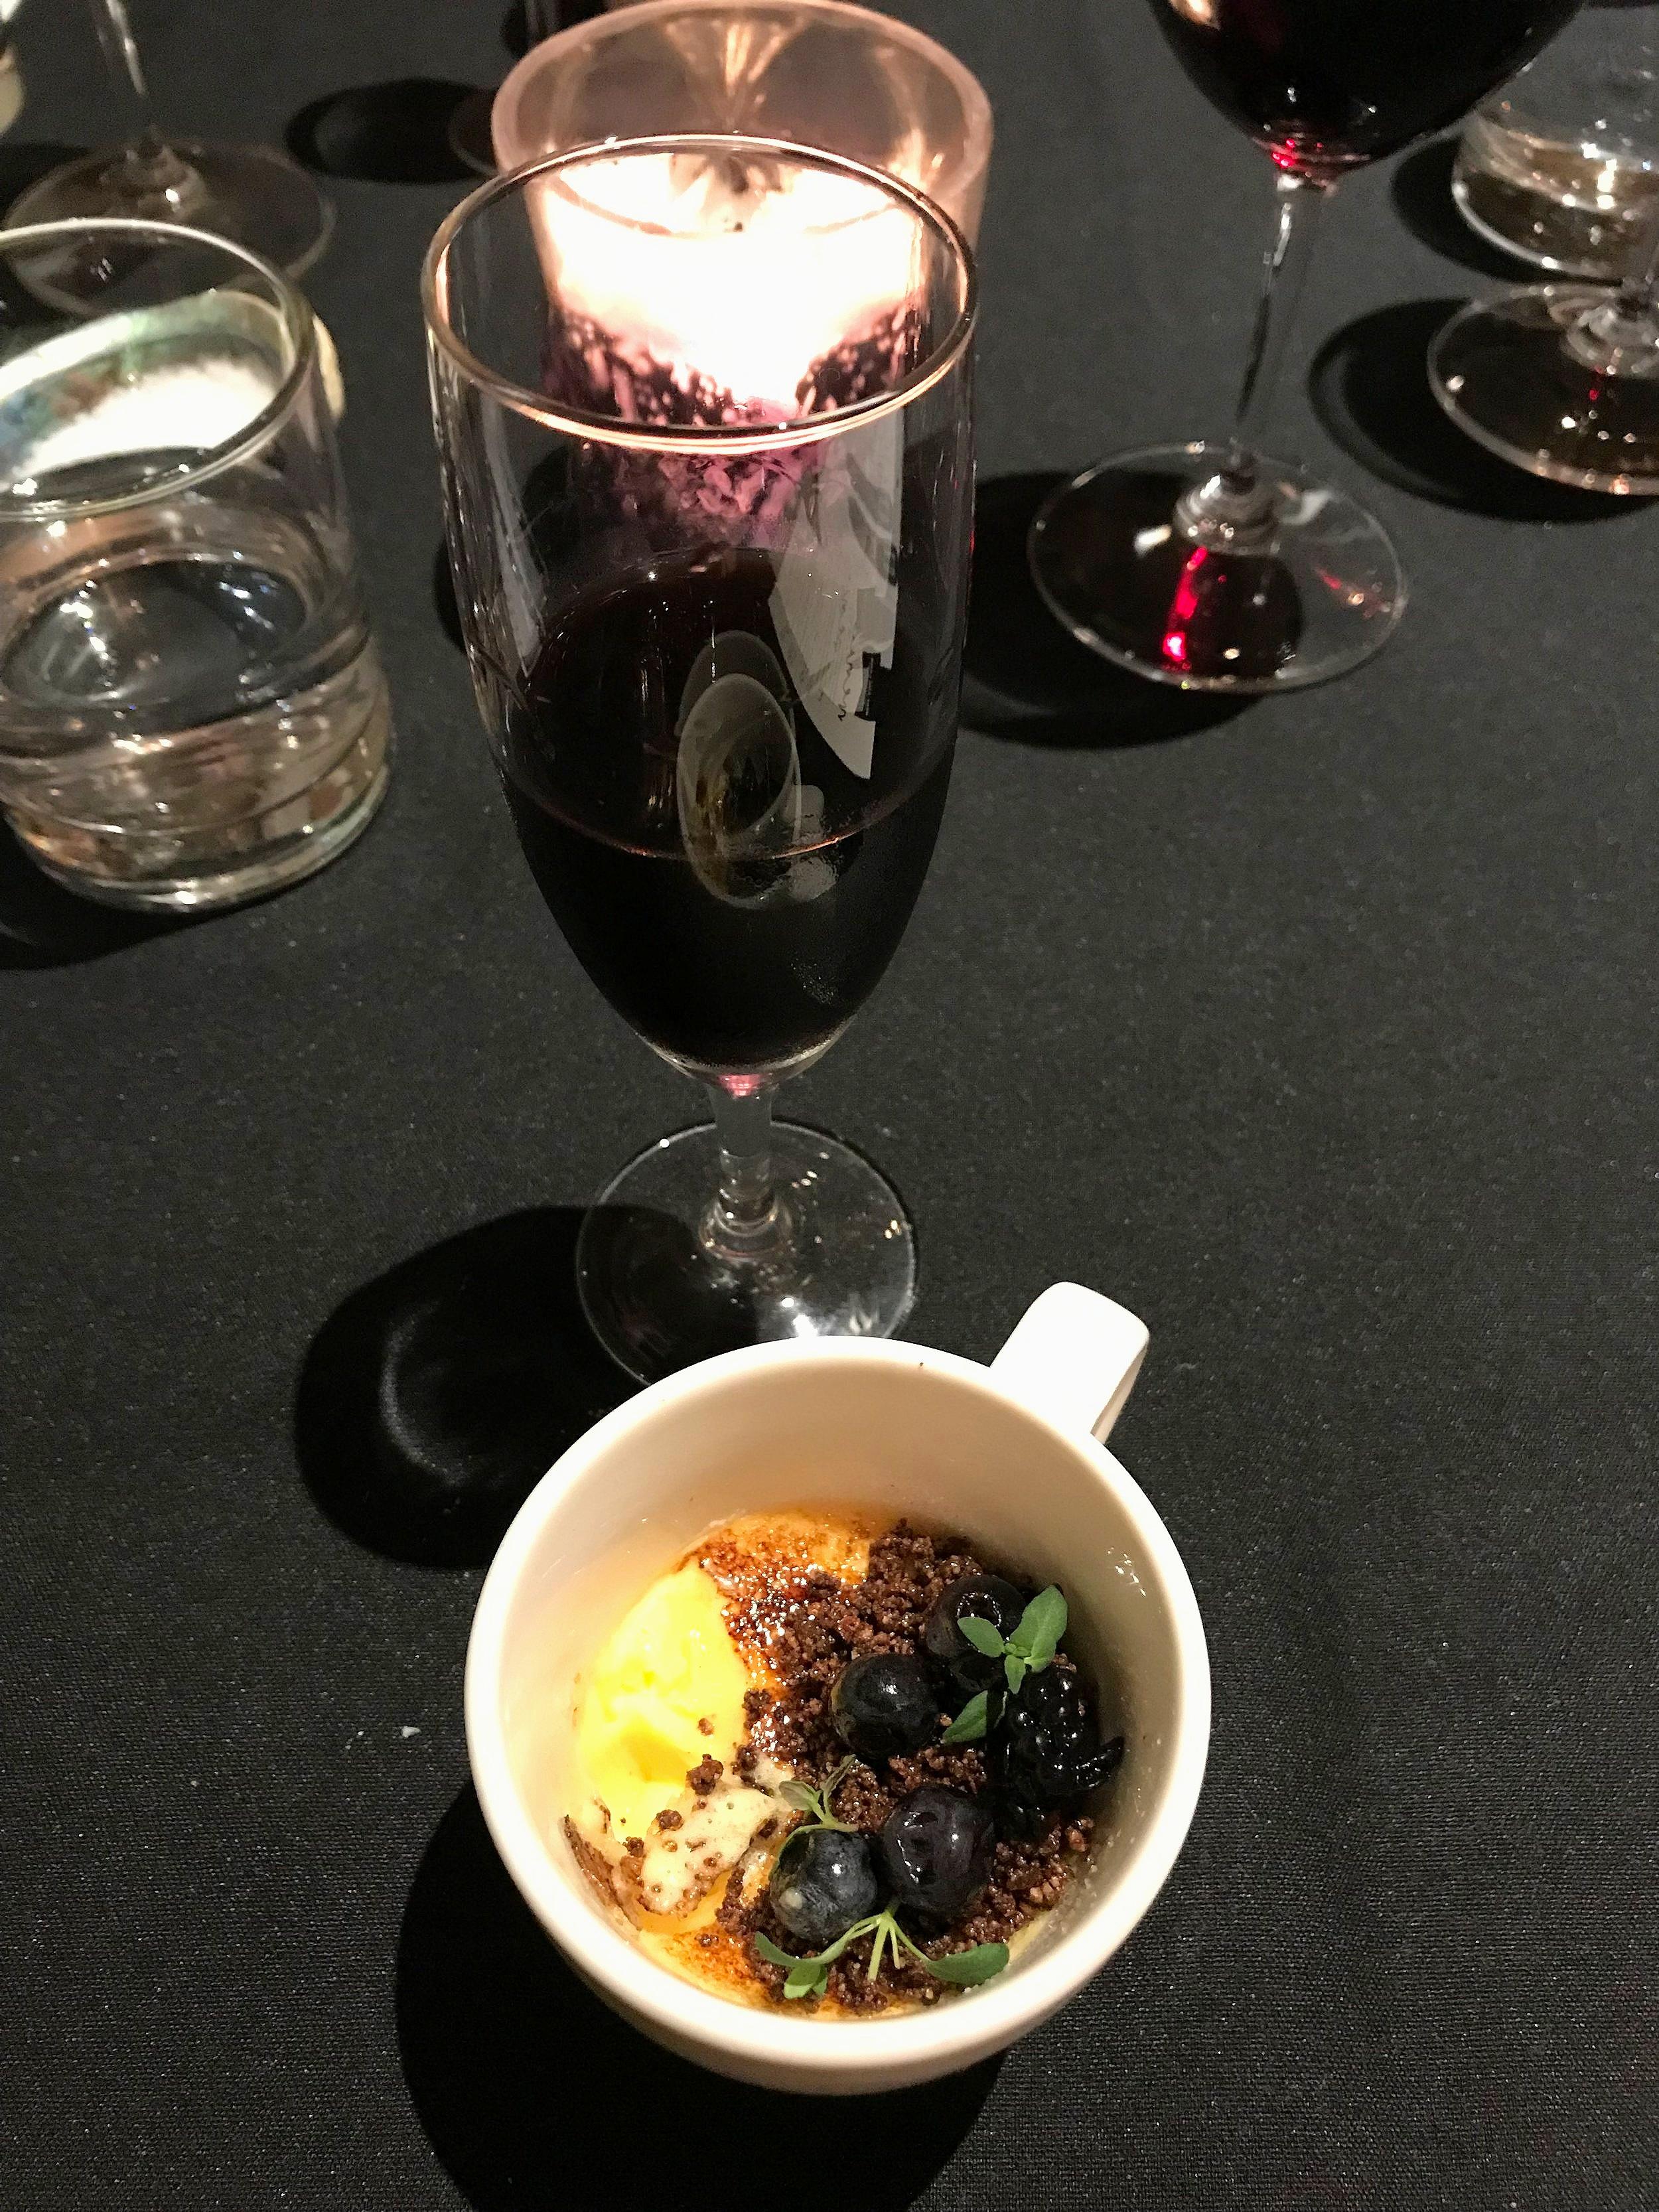 Bone marrow brulee, Autumn berries, thyme & coffee soil